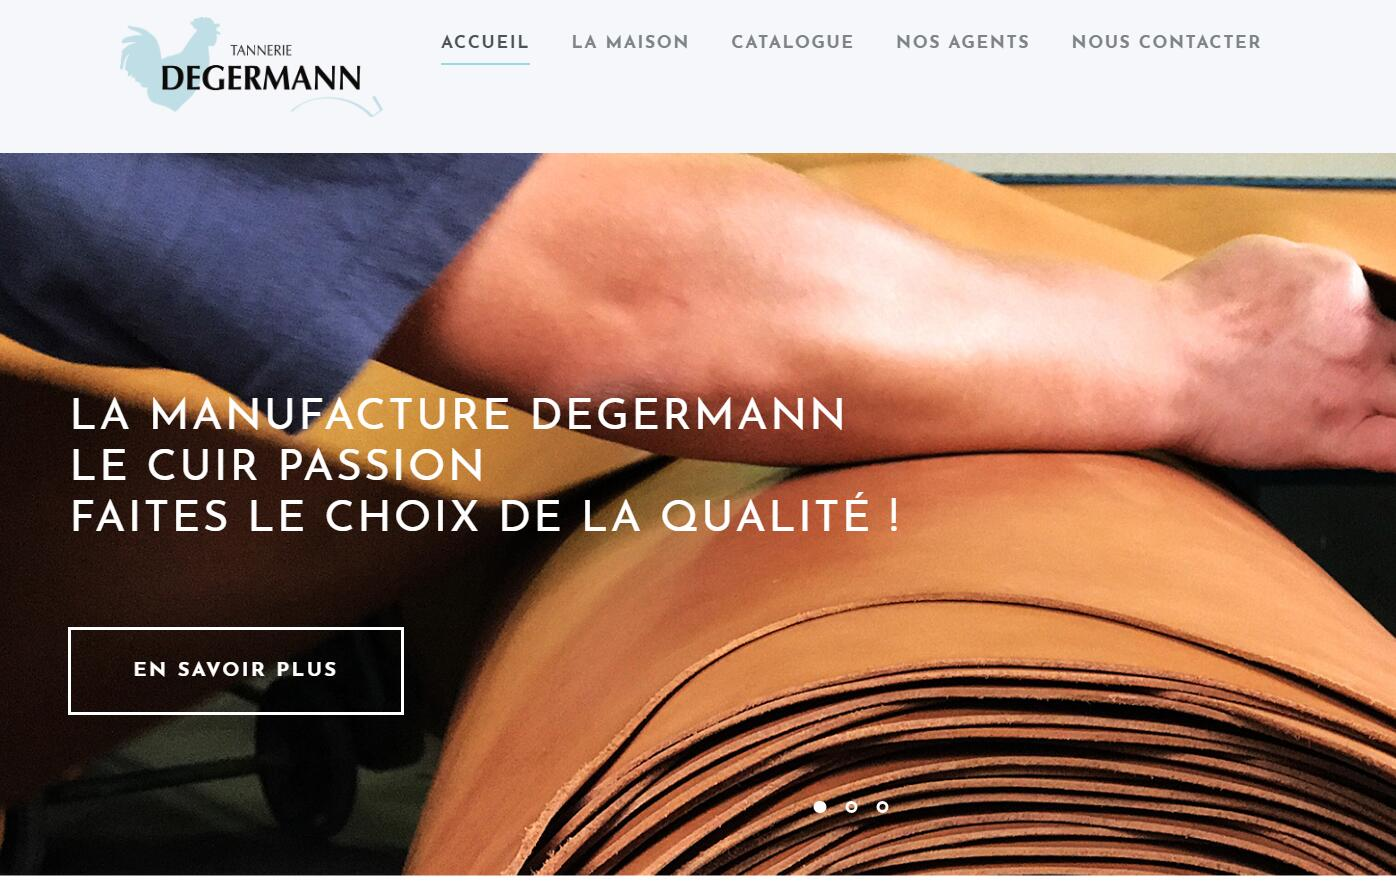 Chanel 将收购法国皮革厂 Degermann,进一步加强对供应链的控制力